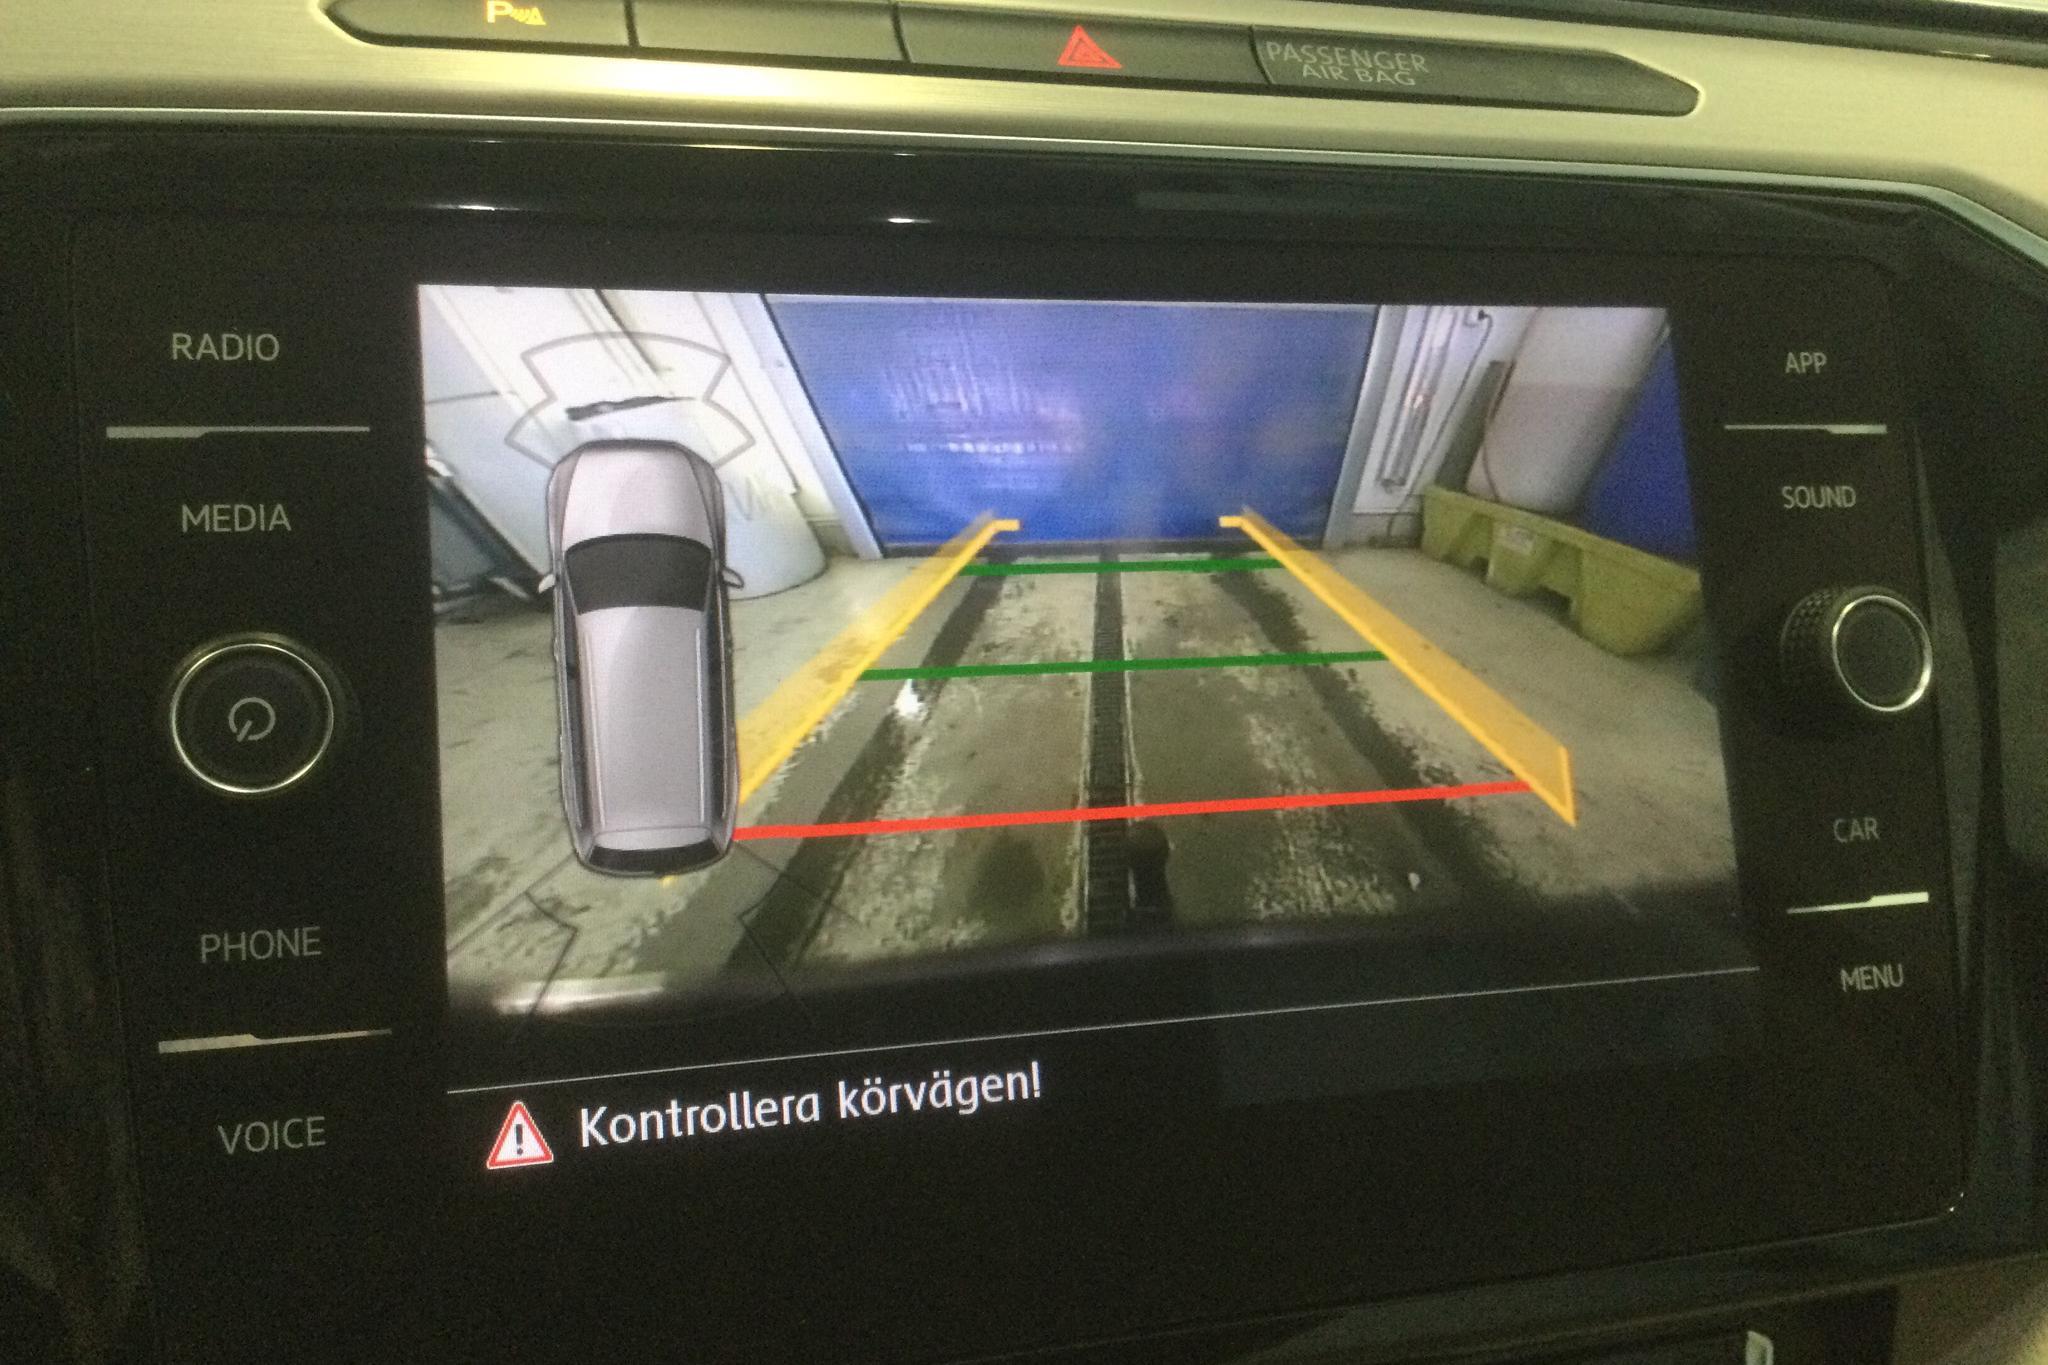 VW Passat Alltrack 2.0 TDI Sportscombi 4MOTION (190hk) - 51 560 km - Automatic - Dark Red - 2018